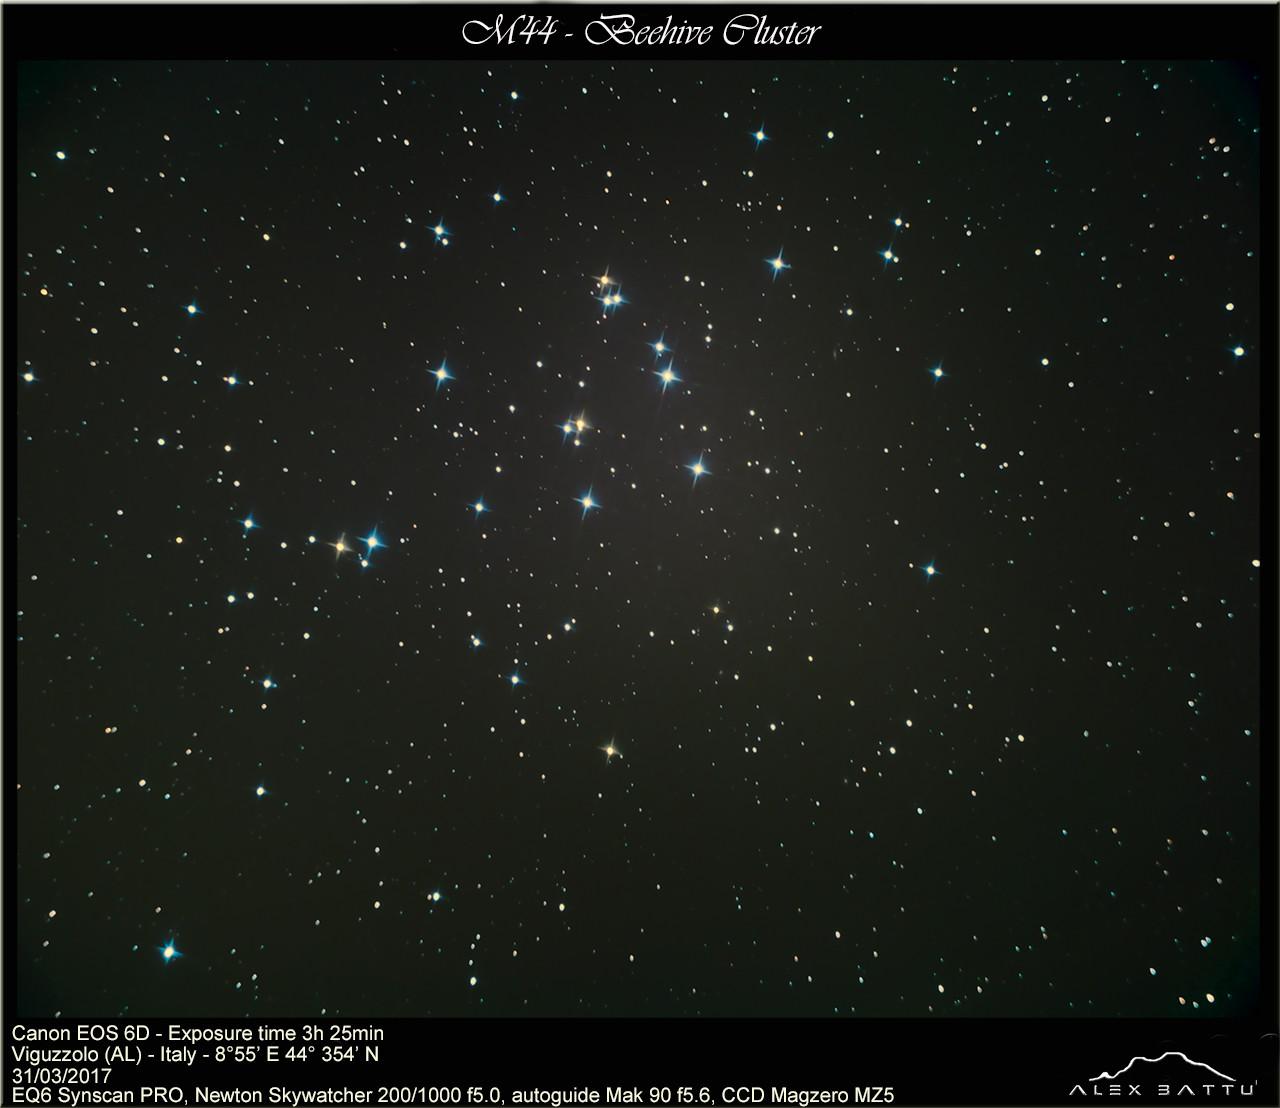 M44 beehive cluster; ammasso presepe; ; astronomia; astrofotografia; astronomy; astrophotography